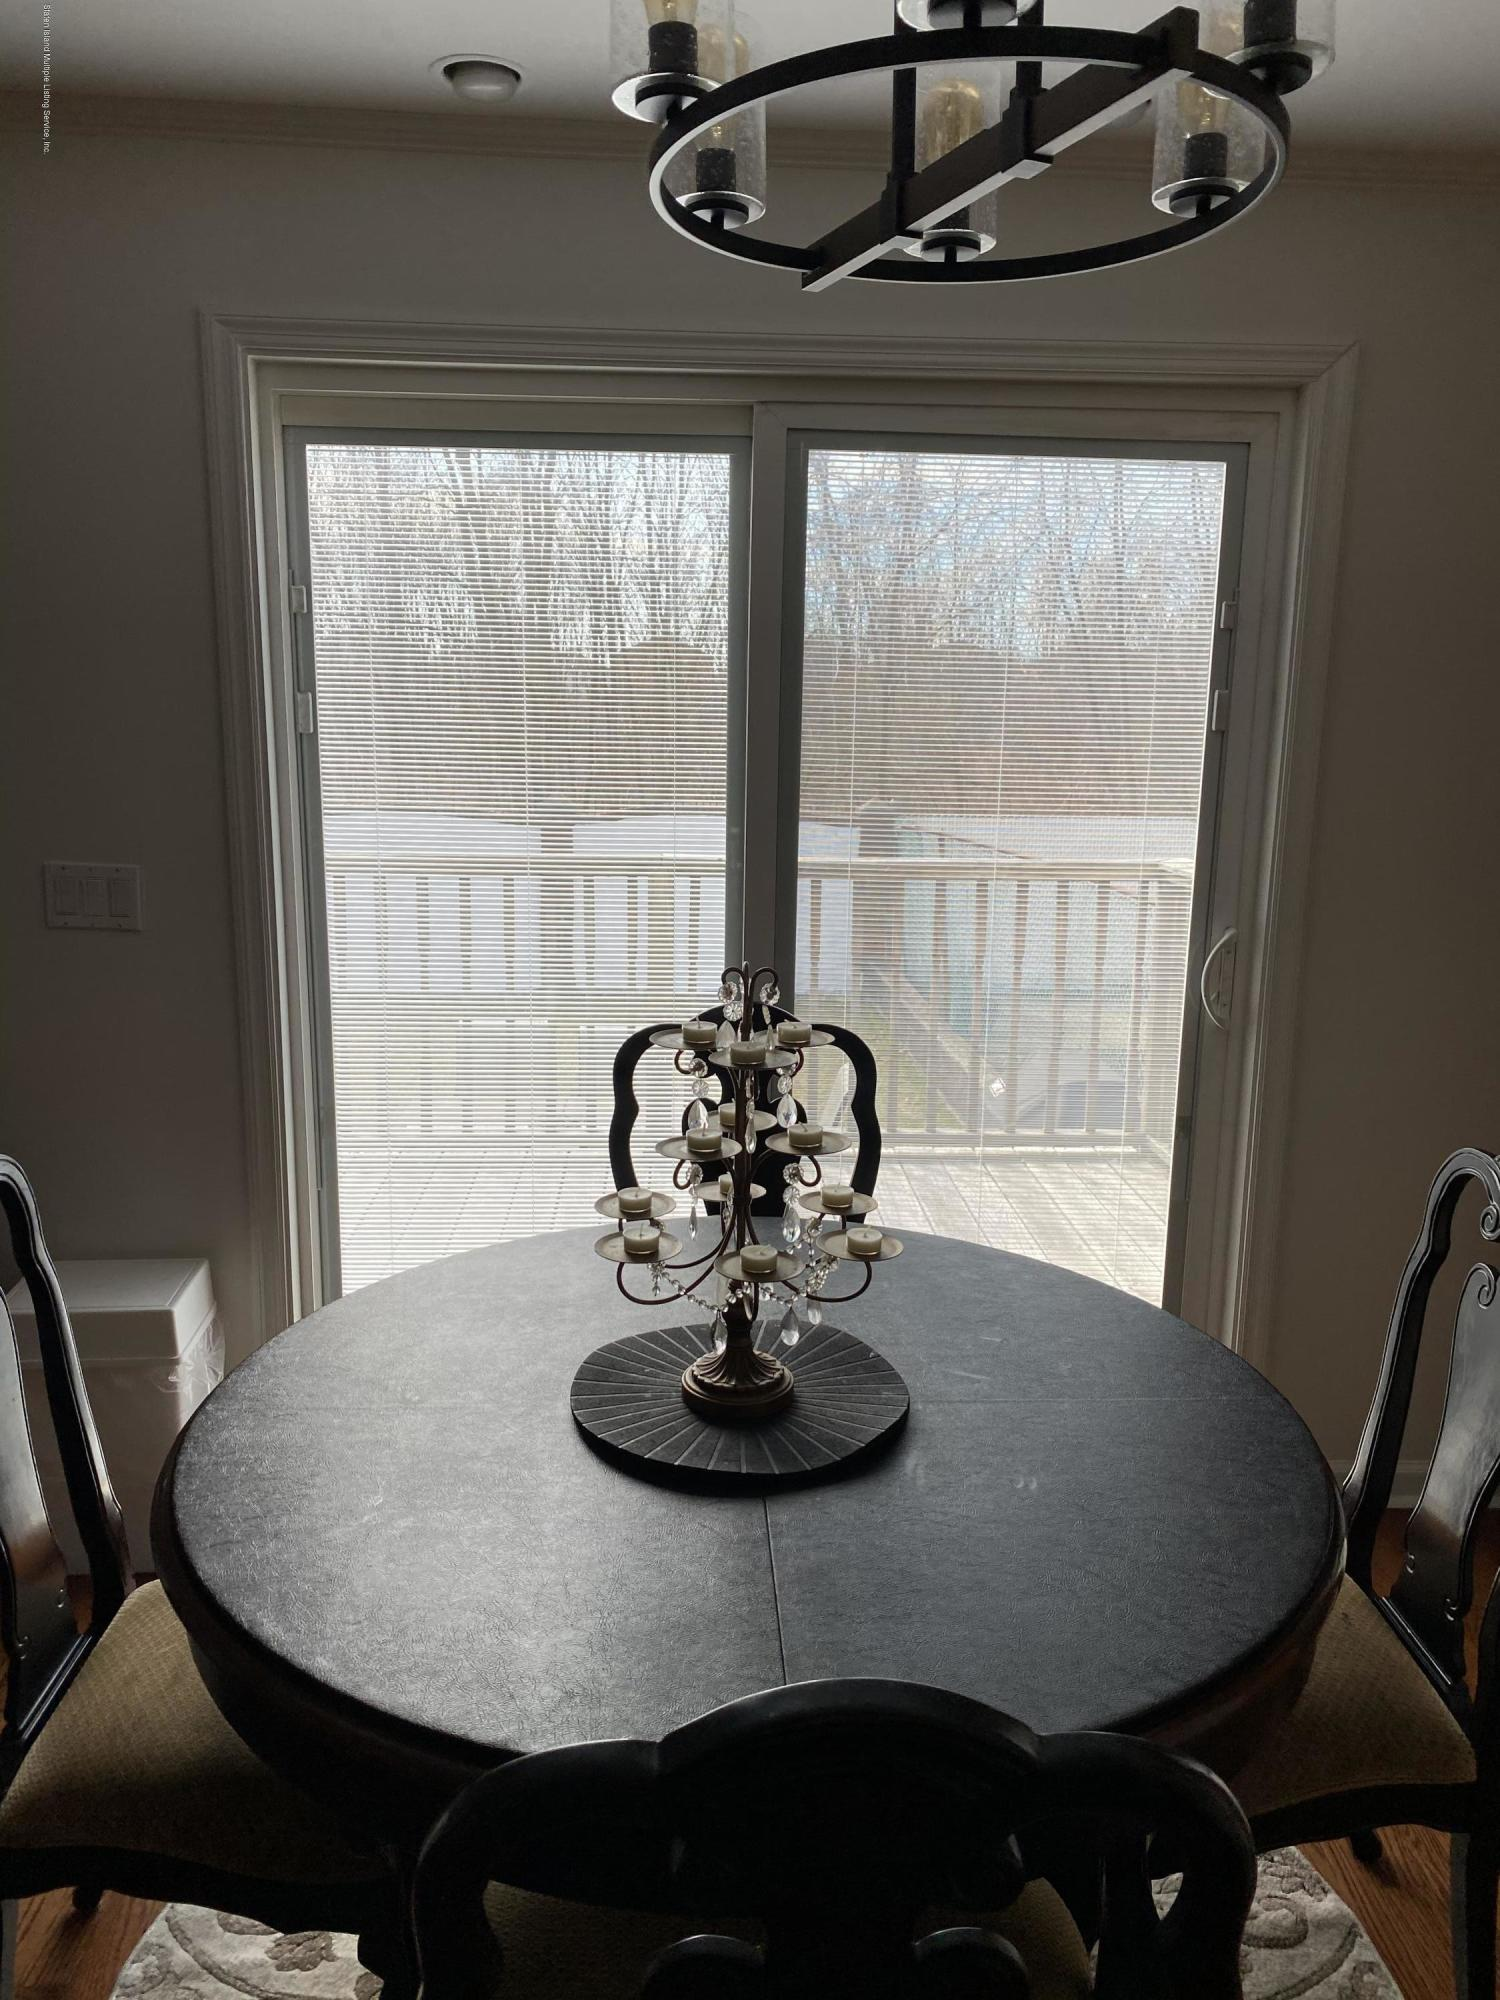 Single Family - Semi-Attached 370 Seaver Avenue  Staten Island, NY 10305, MLS-1136339-25